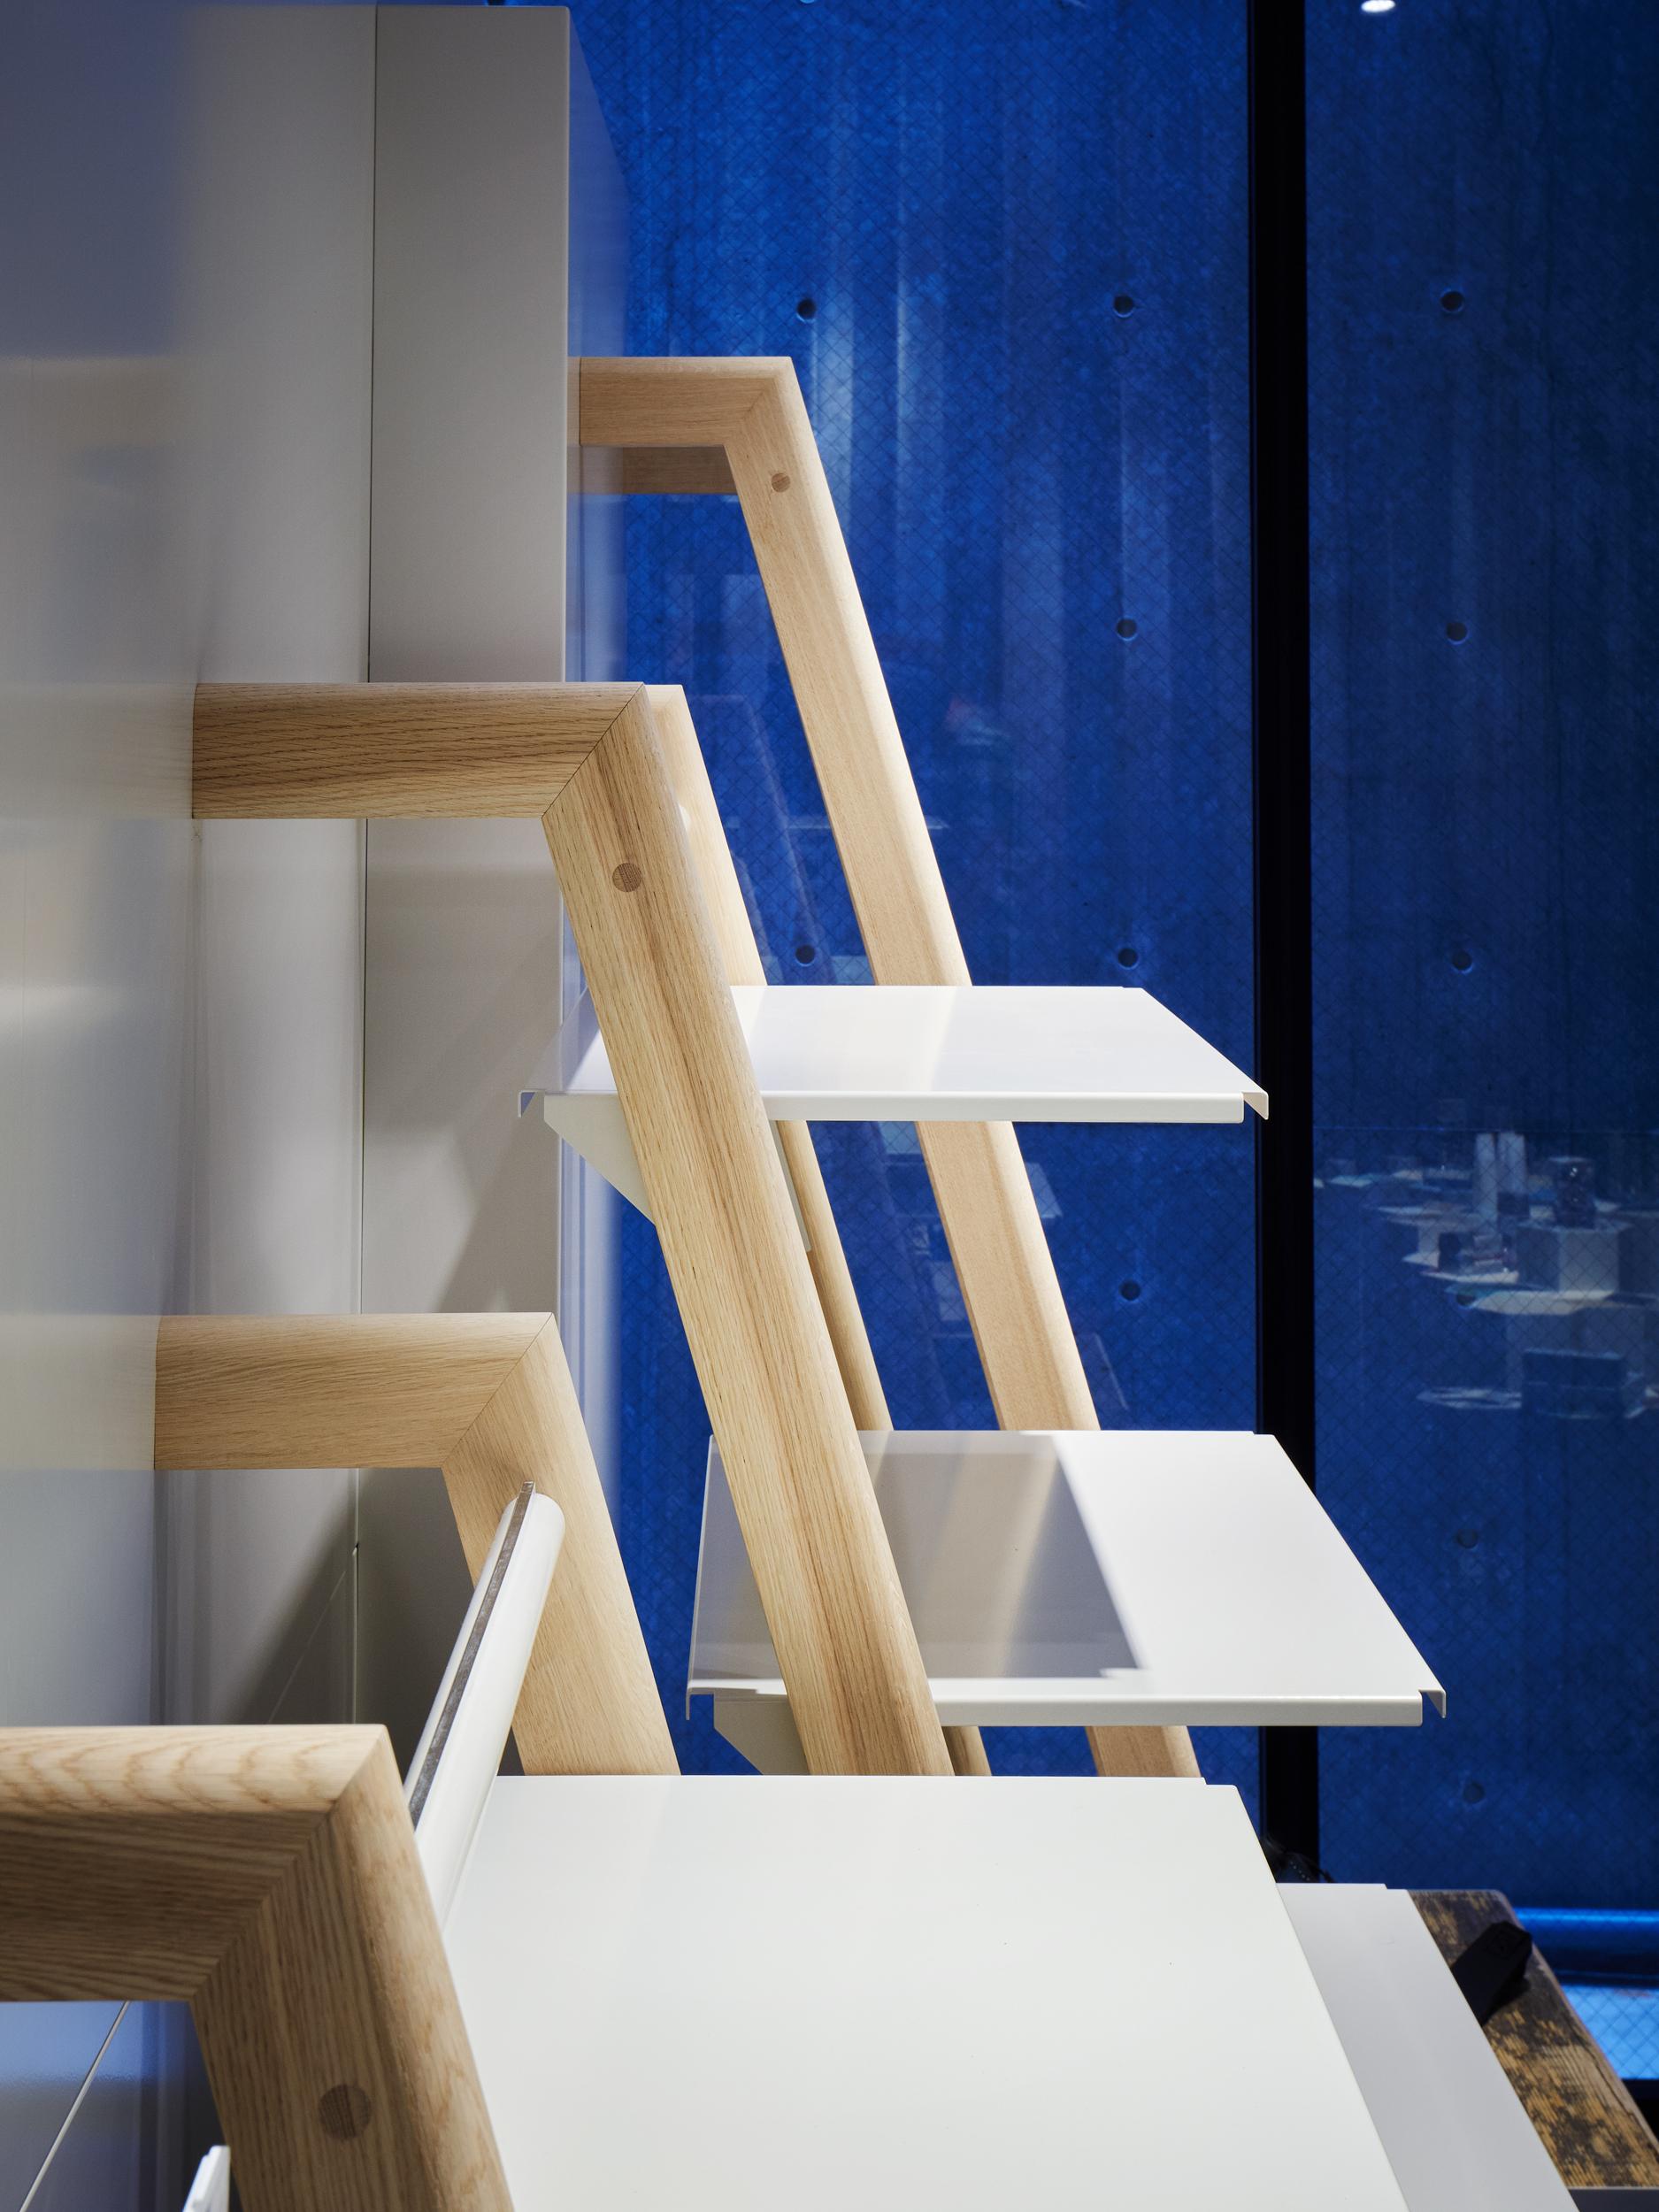 17_Cut Architectures_ l Echoppe Tokyo11 Copyright David foessel.jpg